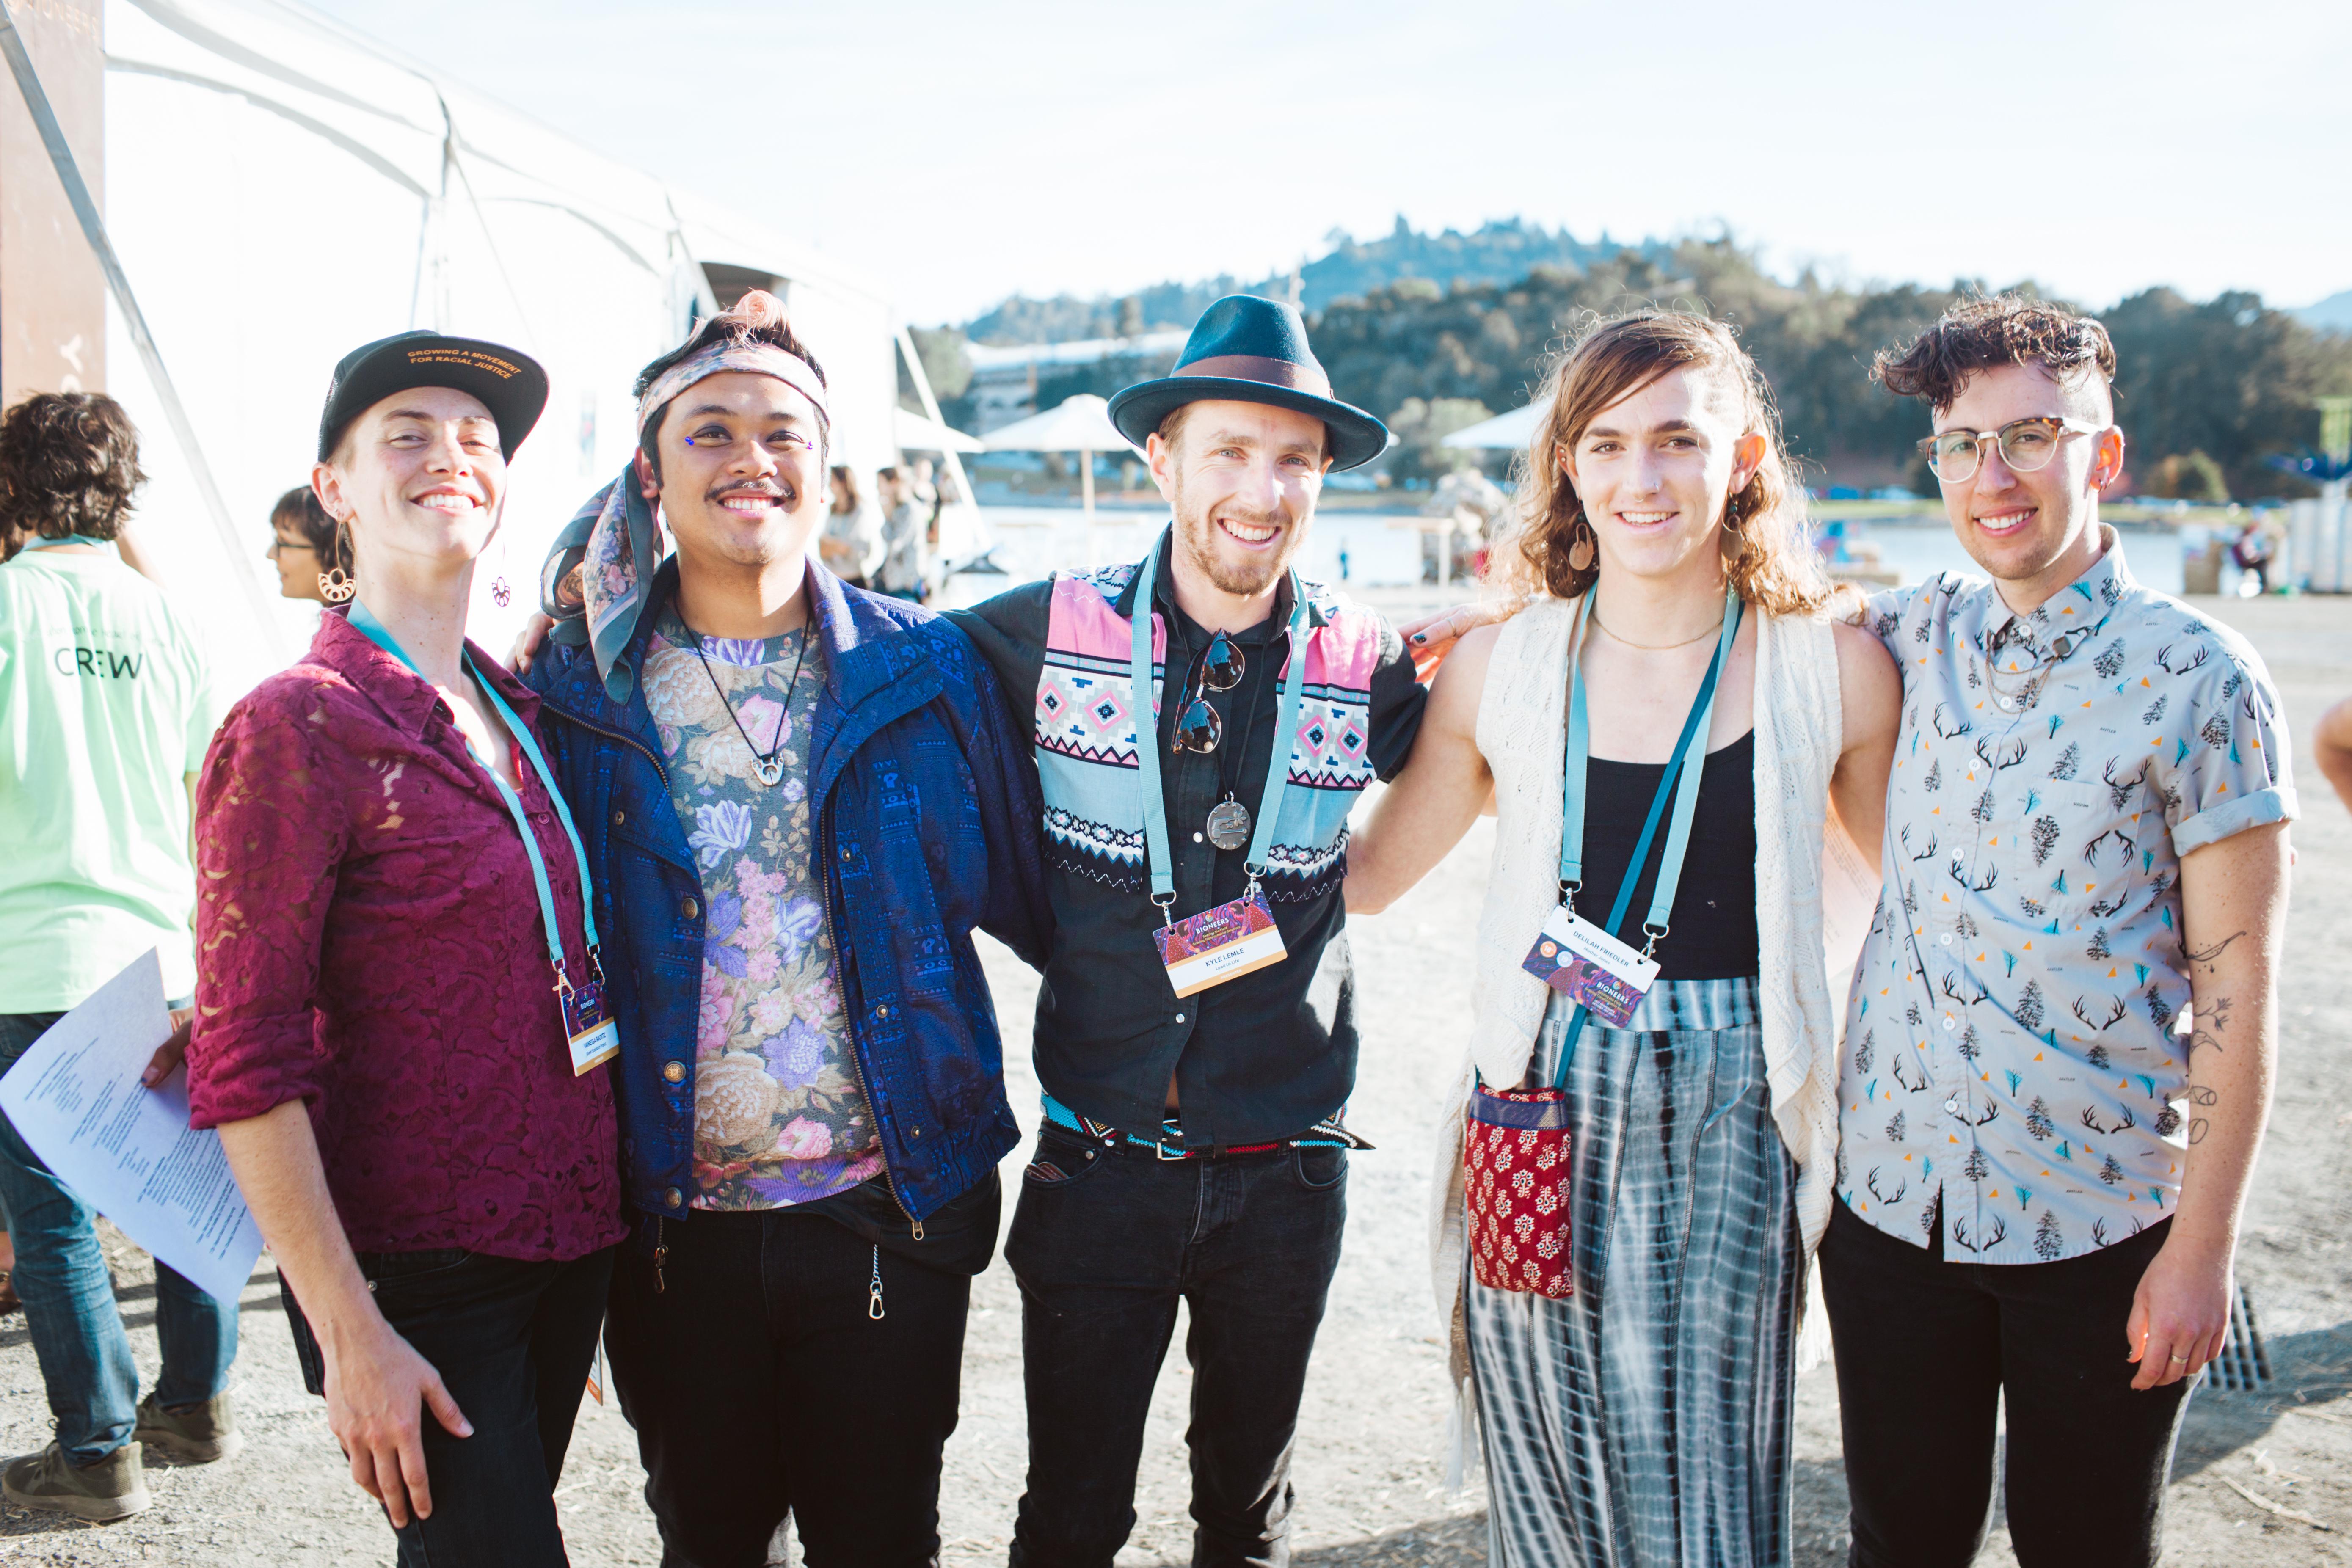 Queer Ecologies Mixer, Bioneers 2019. Left to Right: Vanessa Raditz, Orion Camero, Kyle Lemle, Delilah Frielder, Yanin Kramsky. Photo by Brooke Anderson